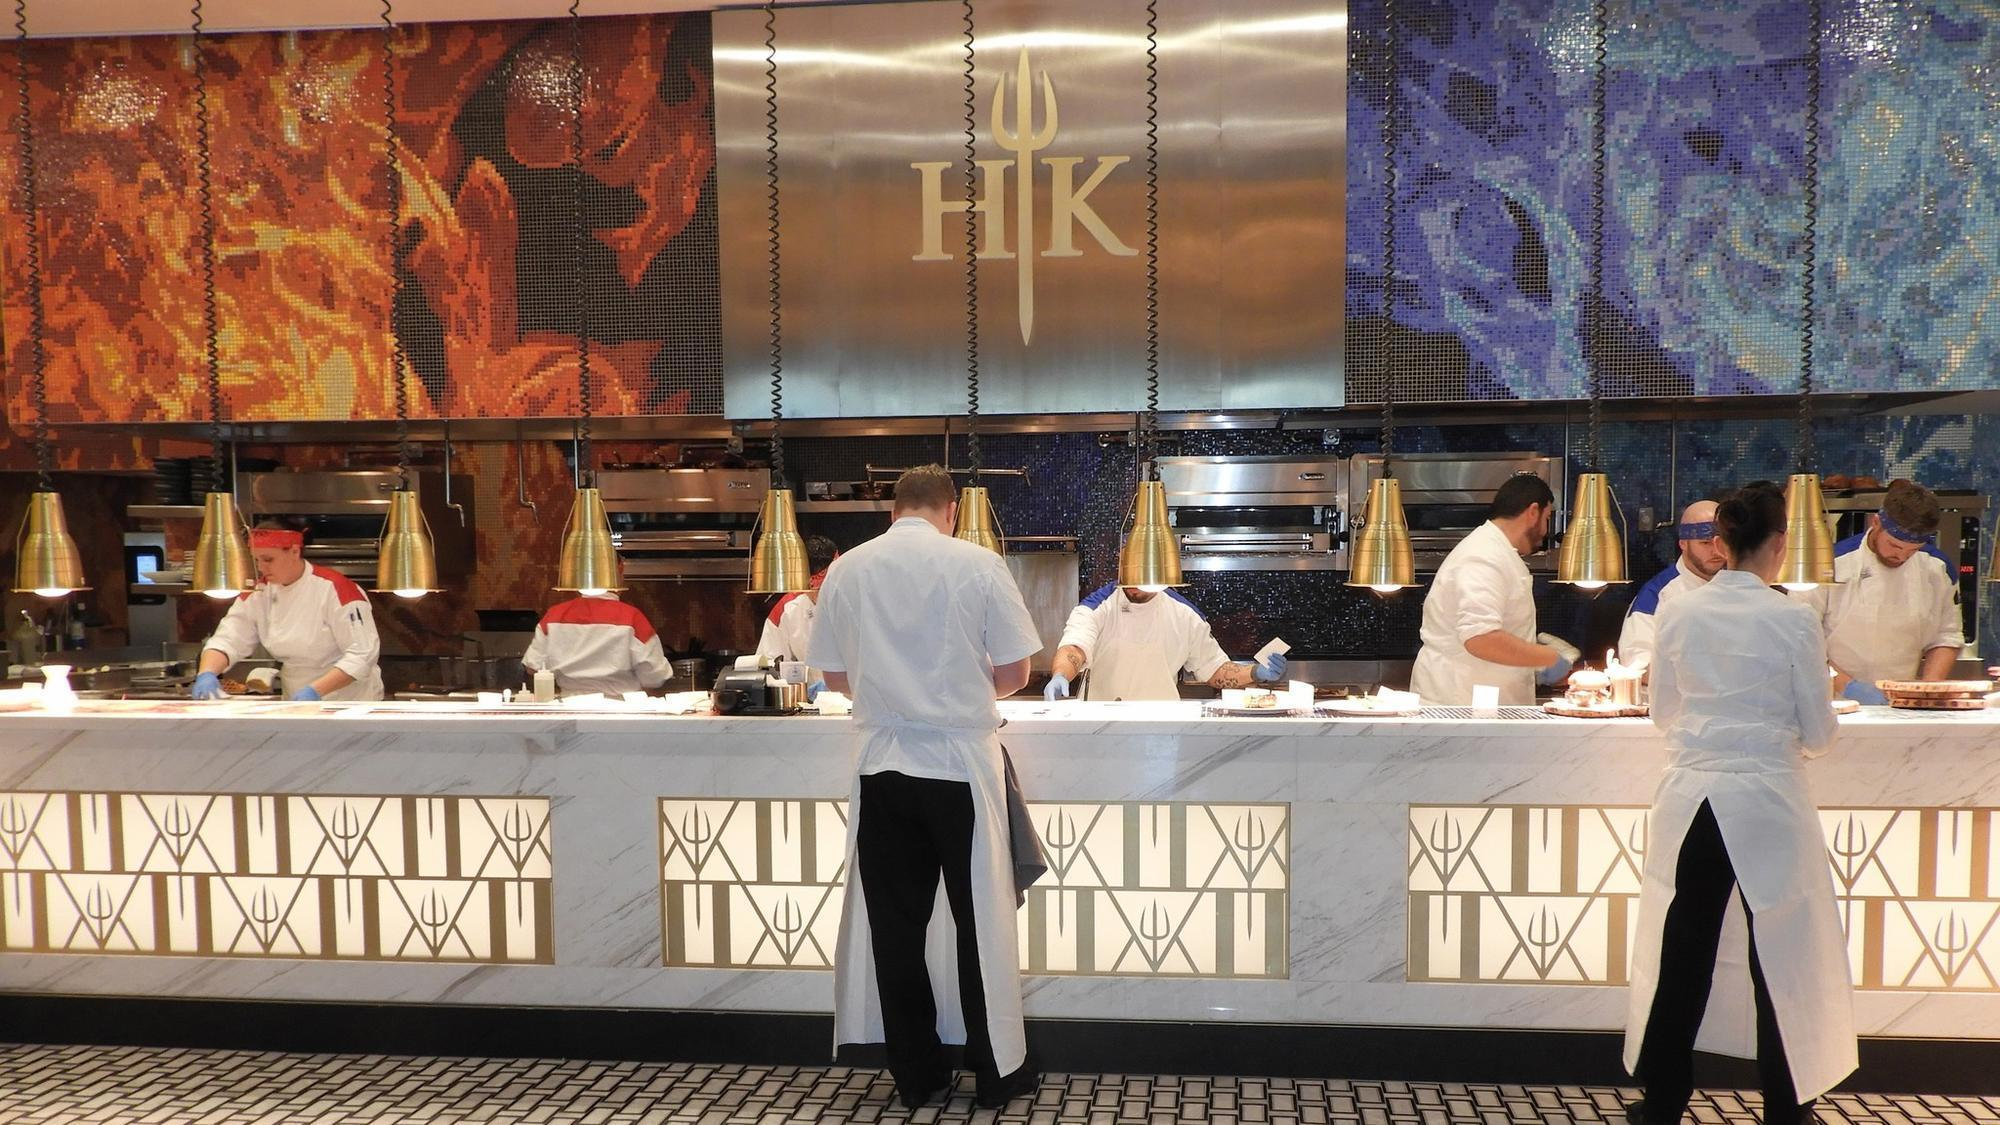 Newly opened hell 39 s kitchen restaurant in las vegas got 50 000 reservations in 10 days gordon for Cuisine las vegas